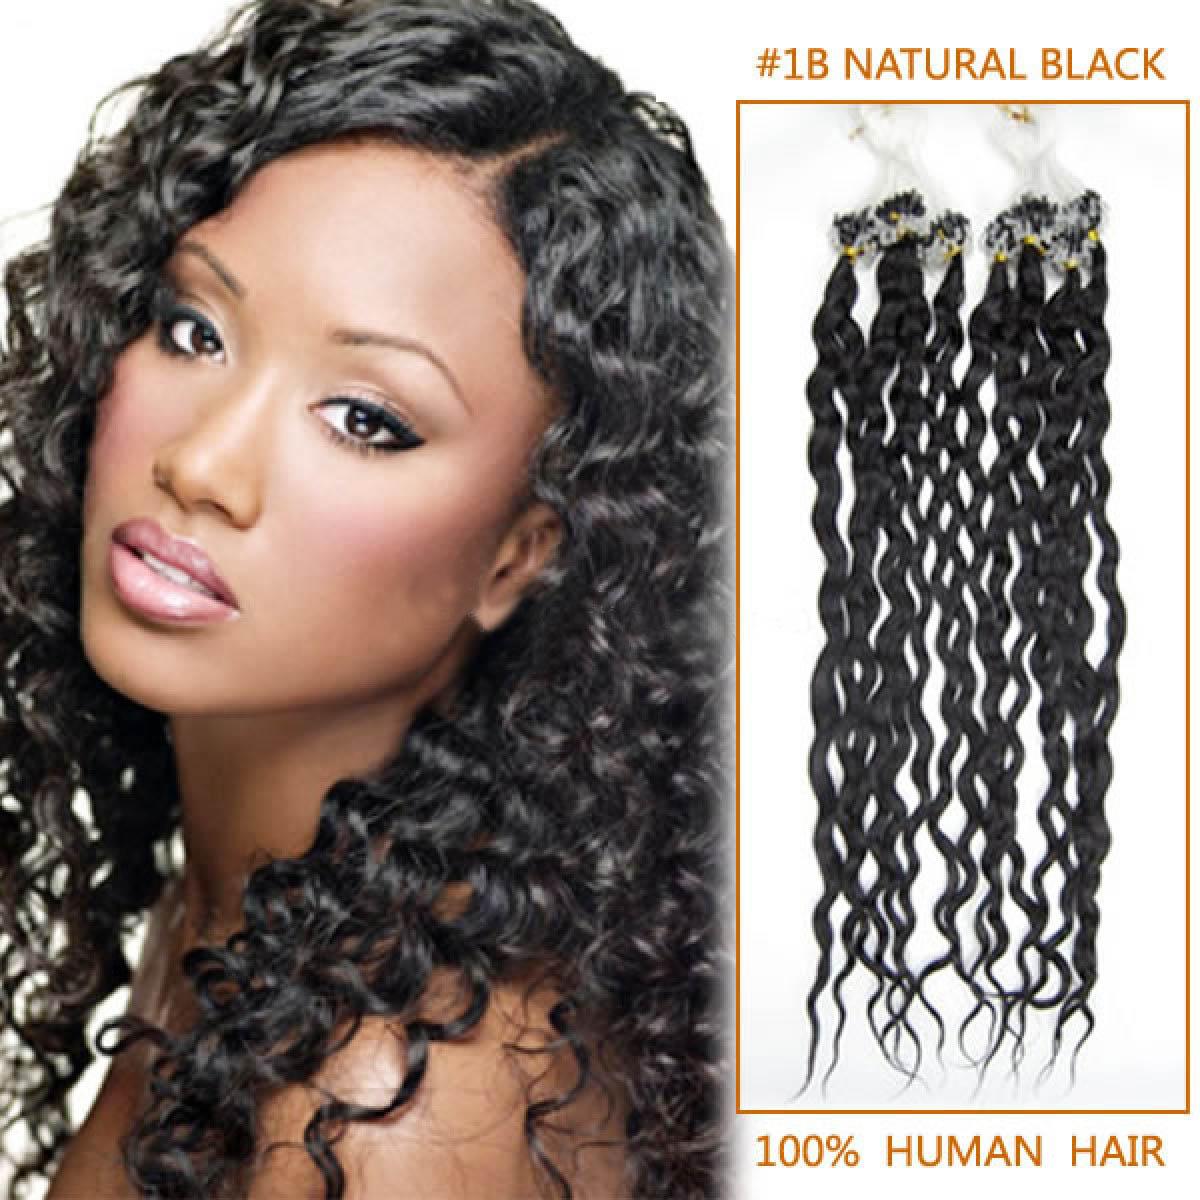 22 Inch Sophisticated 1b Natural Black Curly Micro Loop Hair